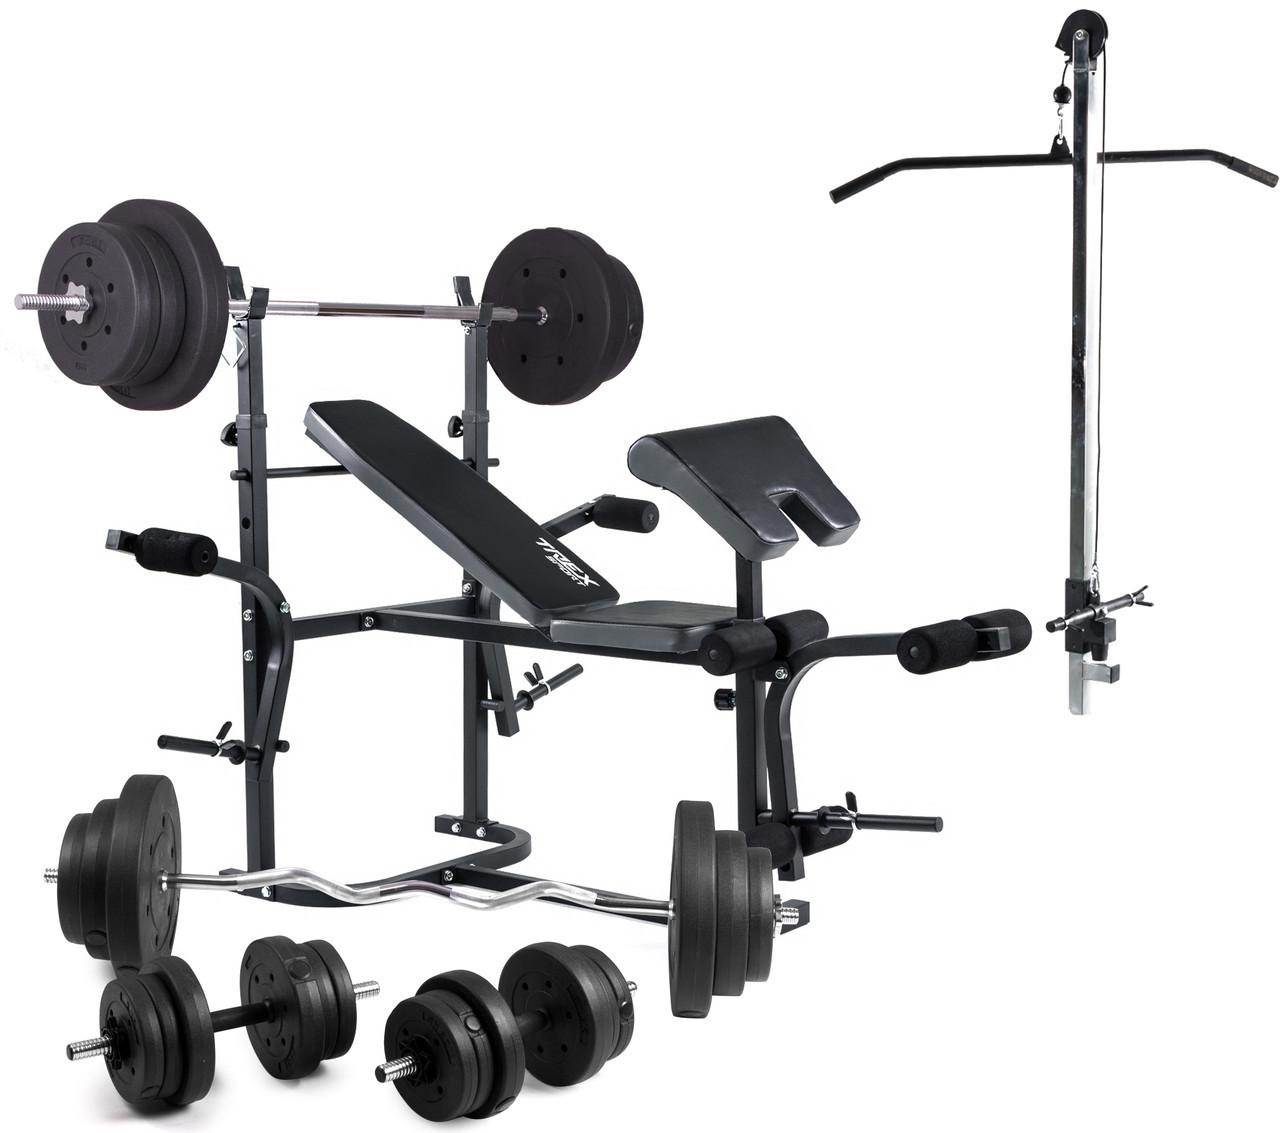 Скамья PRO+Trex 1020 тяга , скотта набор штанга 98 кг